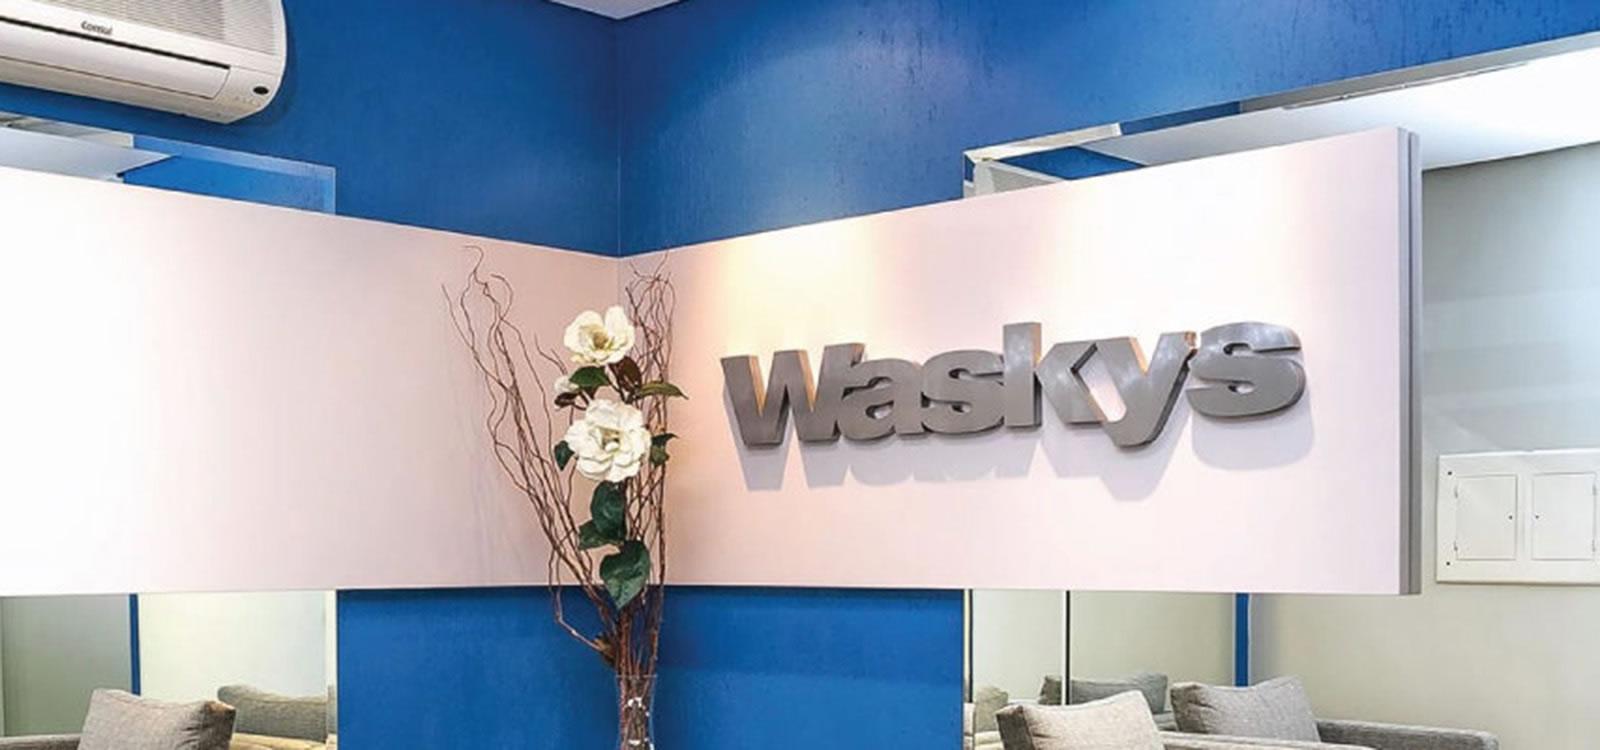 WASKY'S CONTABILIDADE